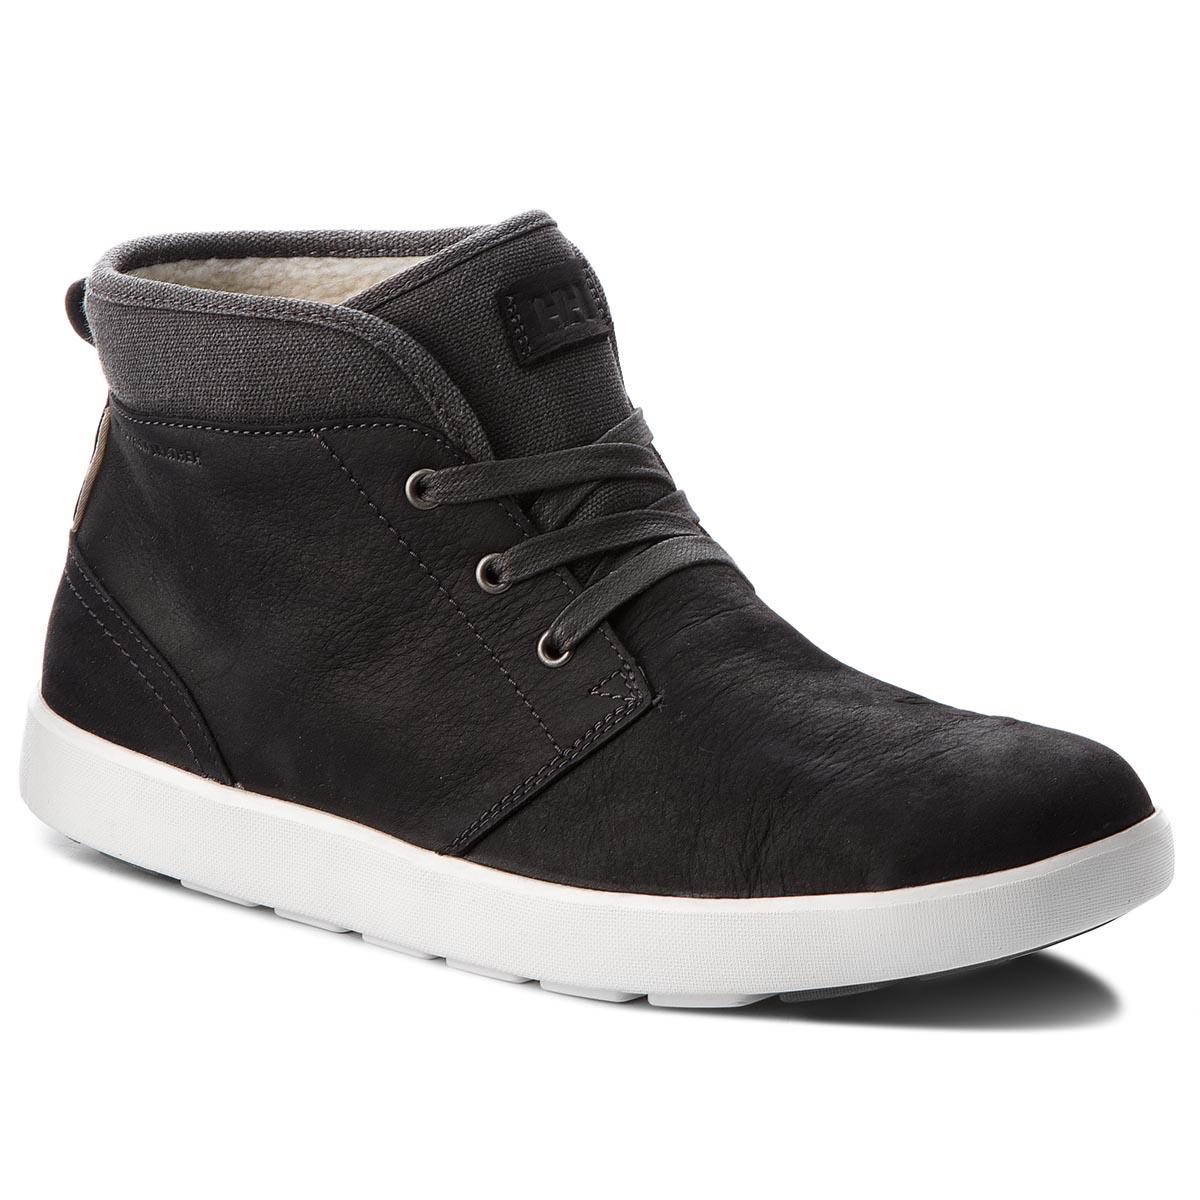 dcb05afb05b0f Hiking Boots HELLY HANSEN - Gataga Prime 112-87.990 Black Charcoal ...